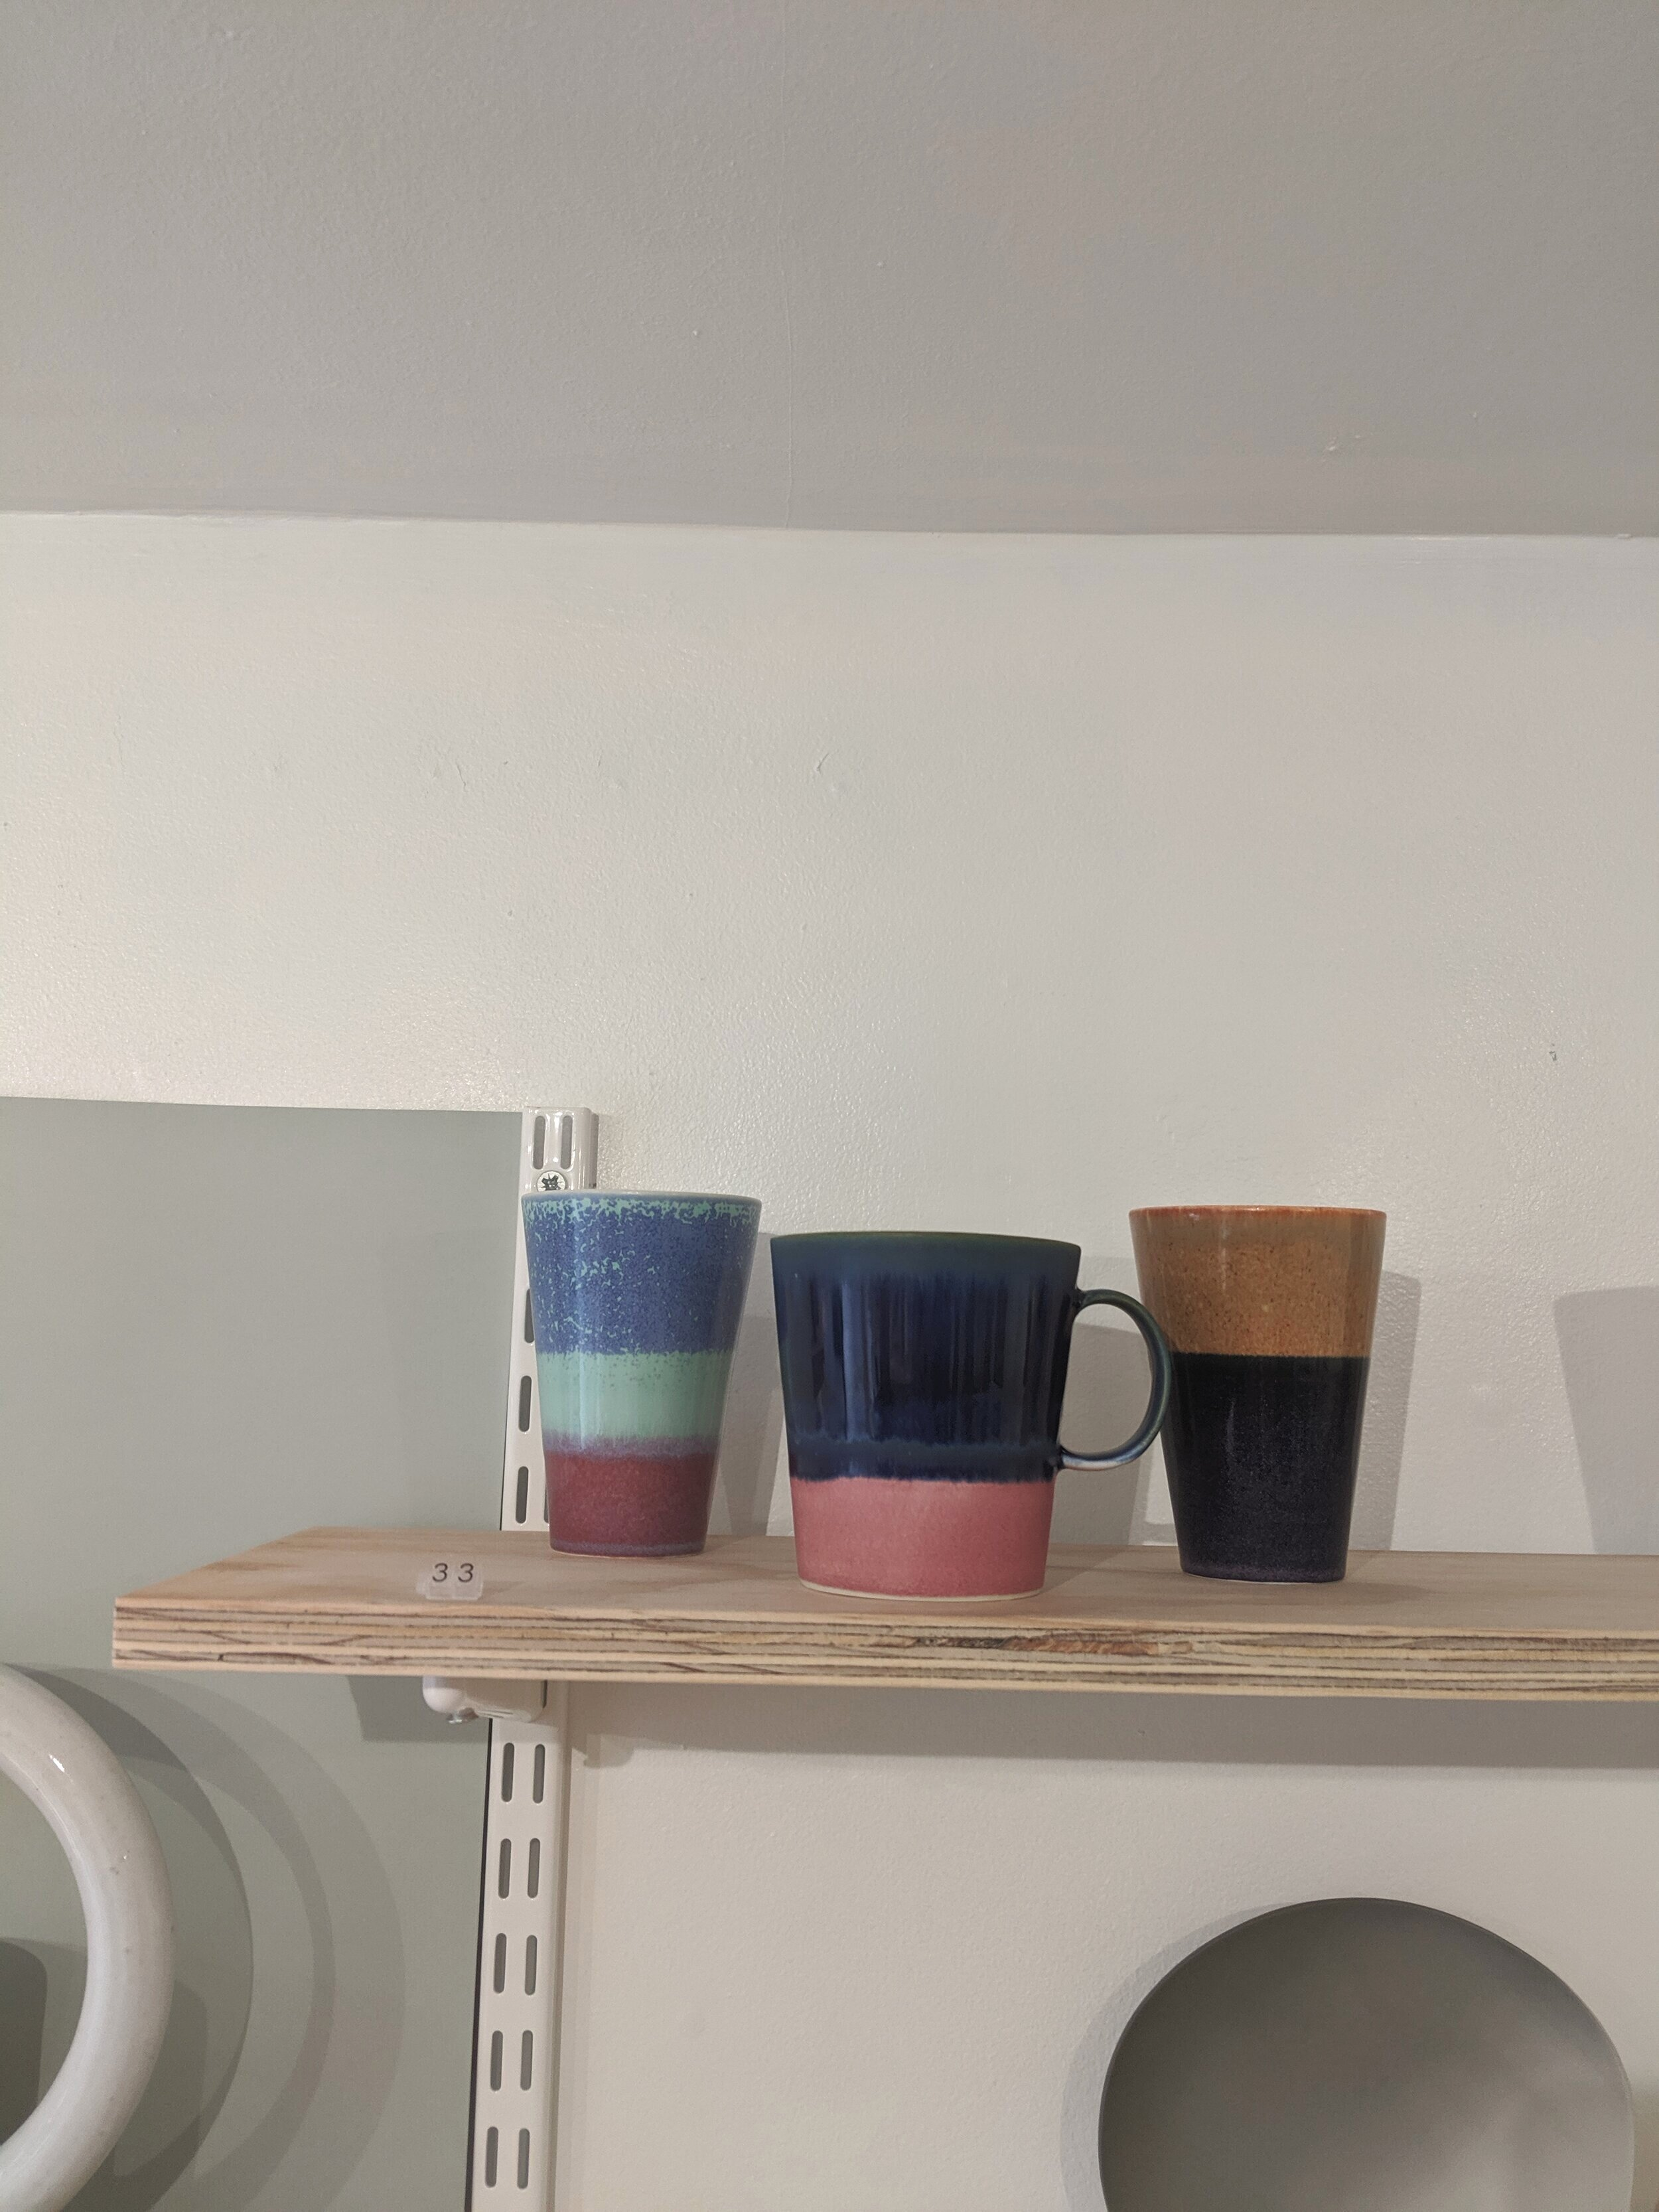 Yuta Segawa Tumblers and mugs, glazed porcelain.